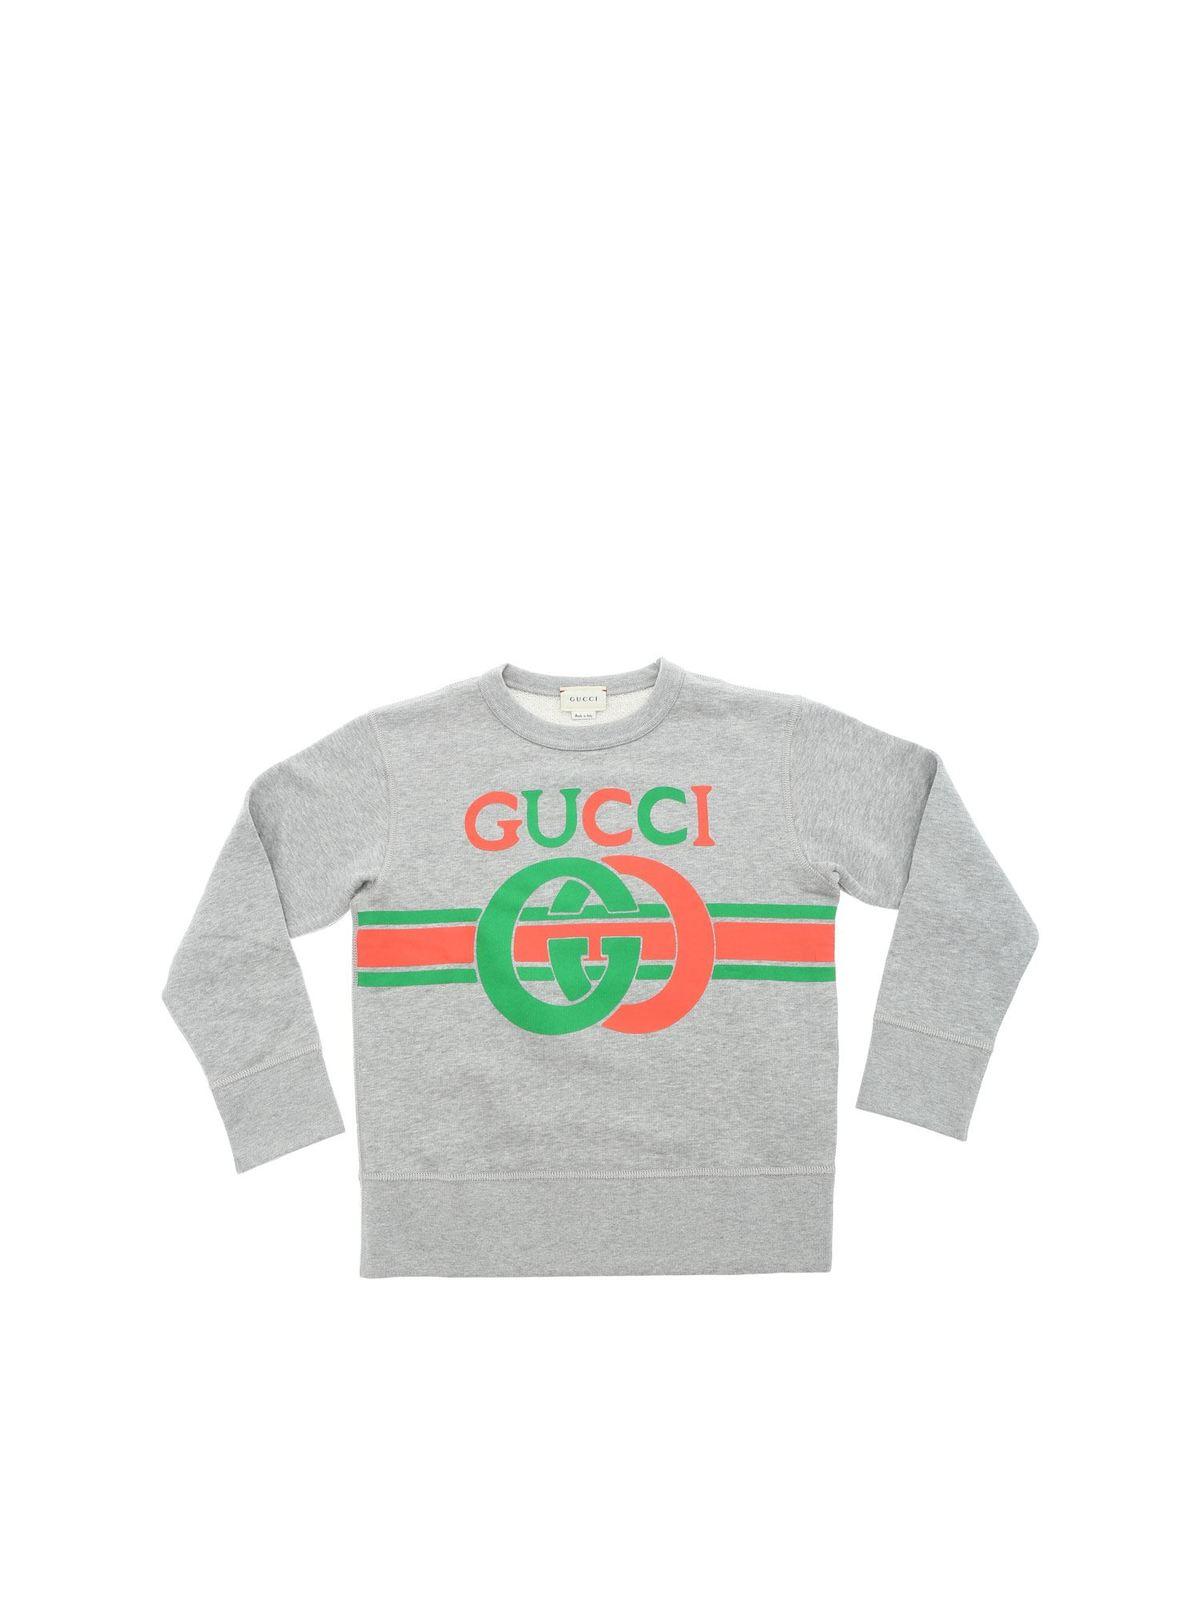 Gucci Kids' Gg Logo Sweatshirt In Gray In Grey